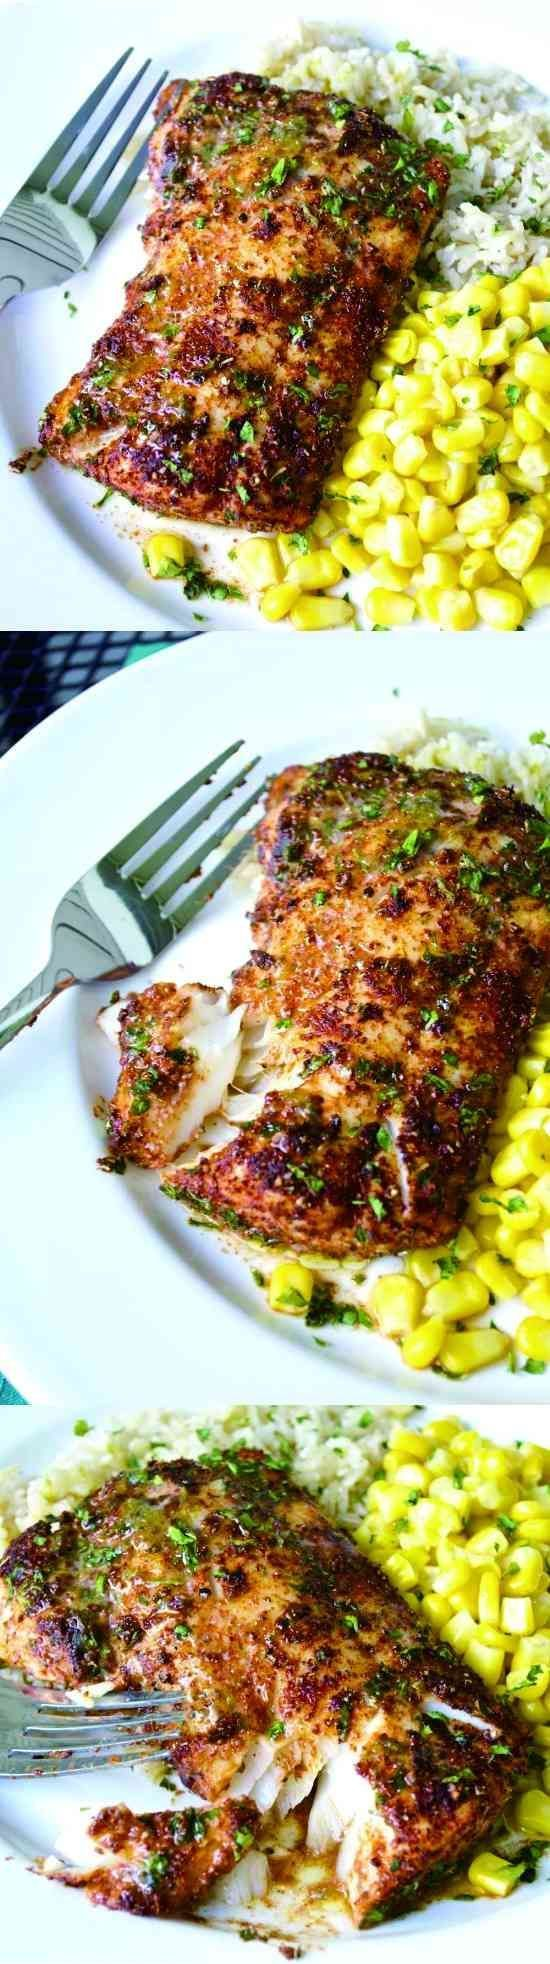 Roasted Chili-Lime Cod - black pepper, garlic, healthy, paprika, recipes